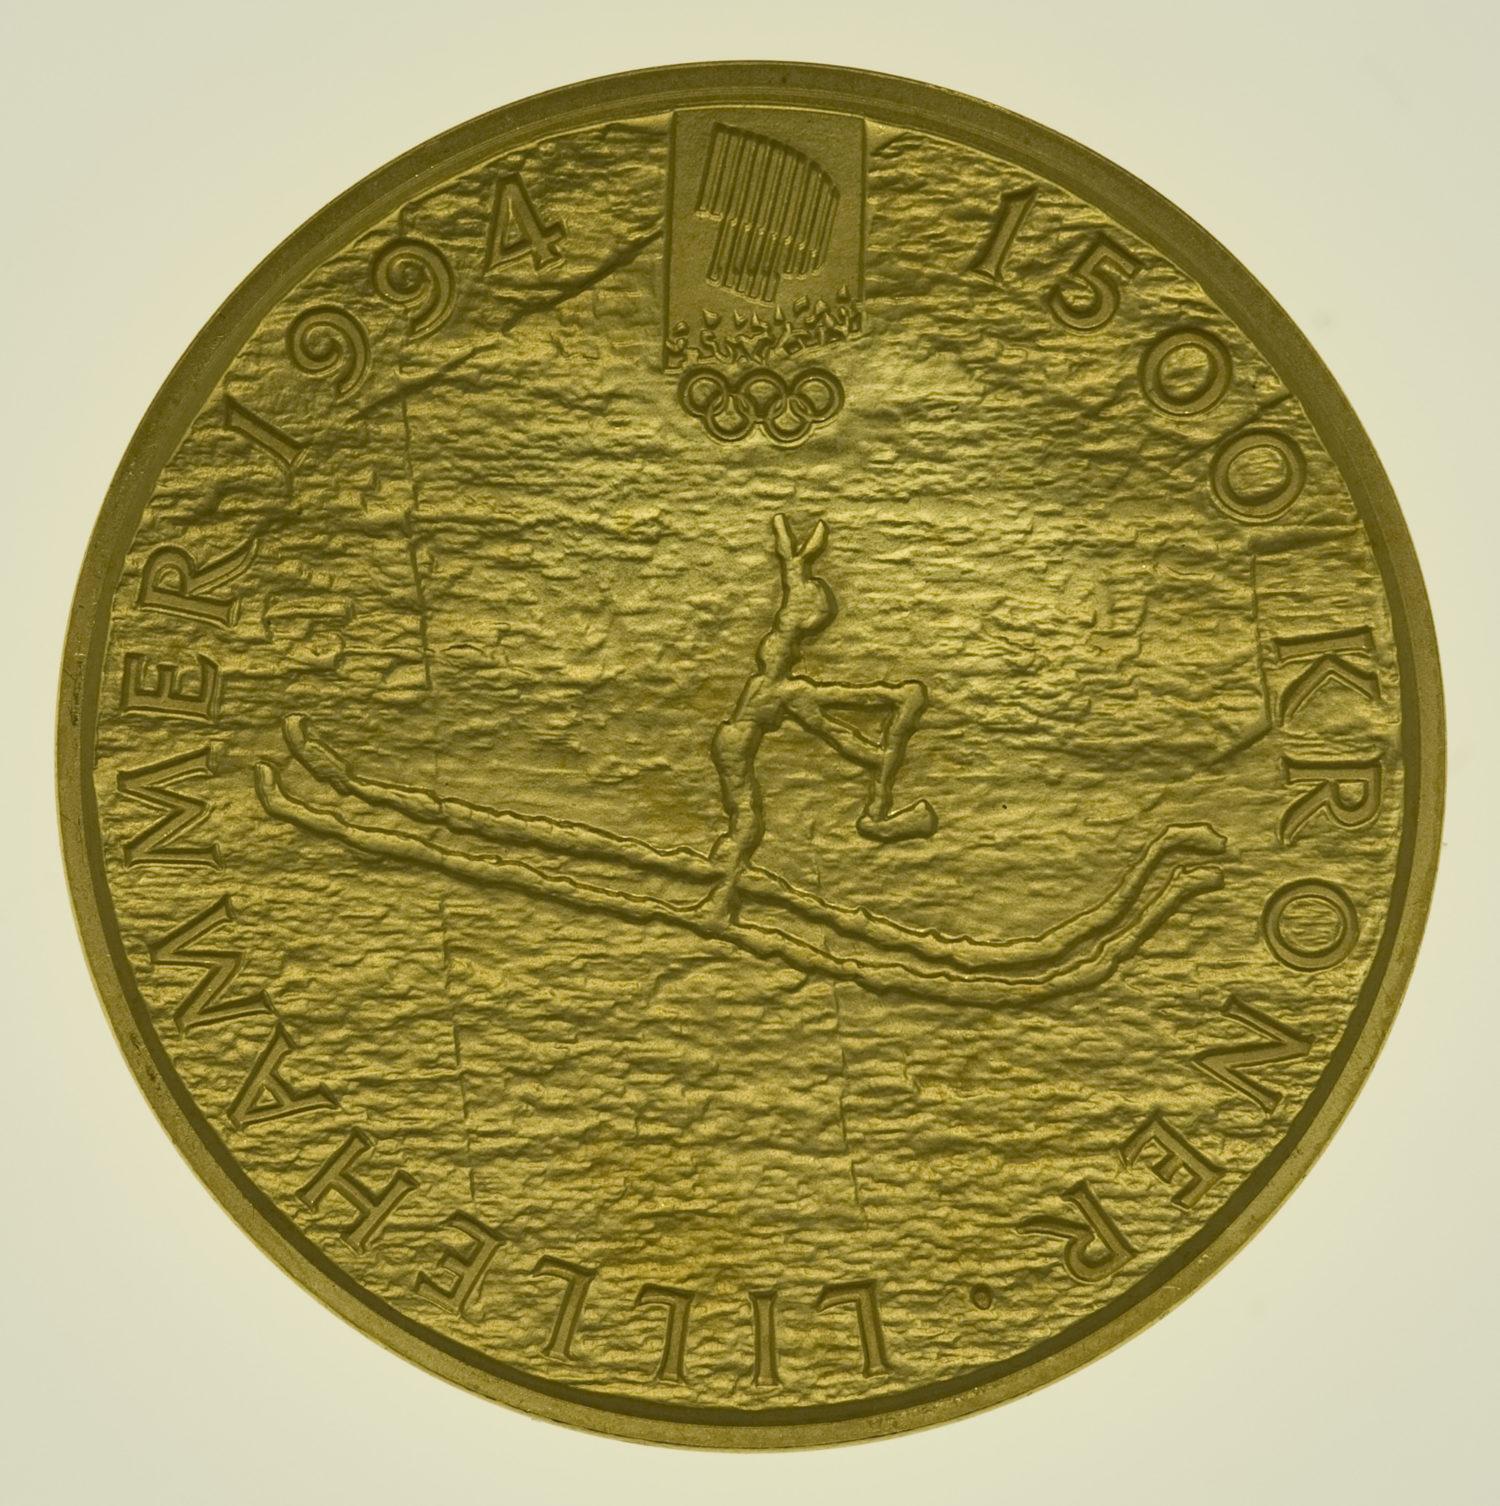 norwegen - Norwegen Olav V. 1500 Kronen 1991